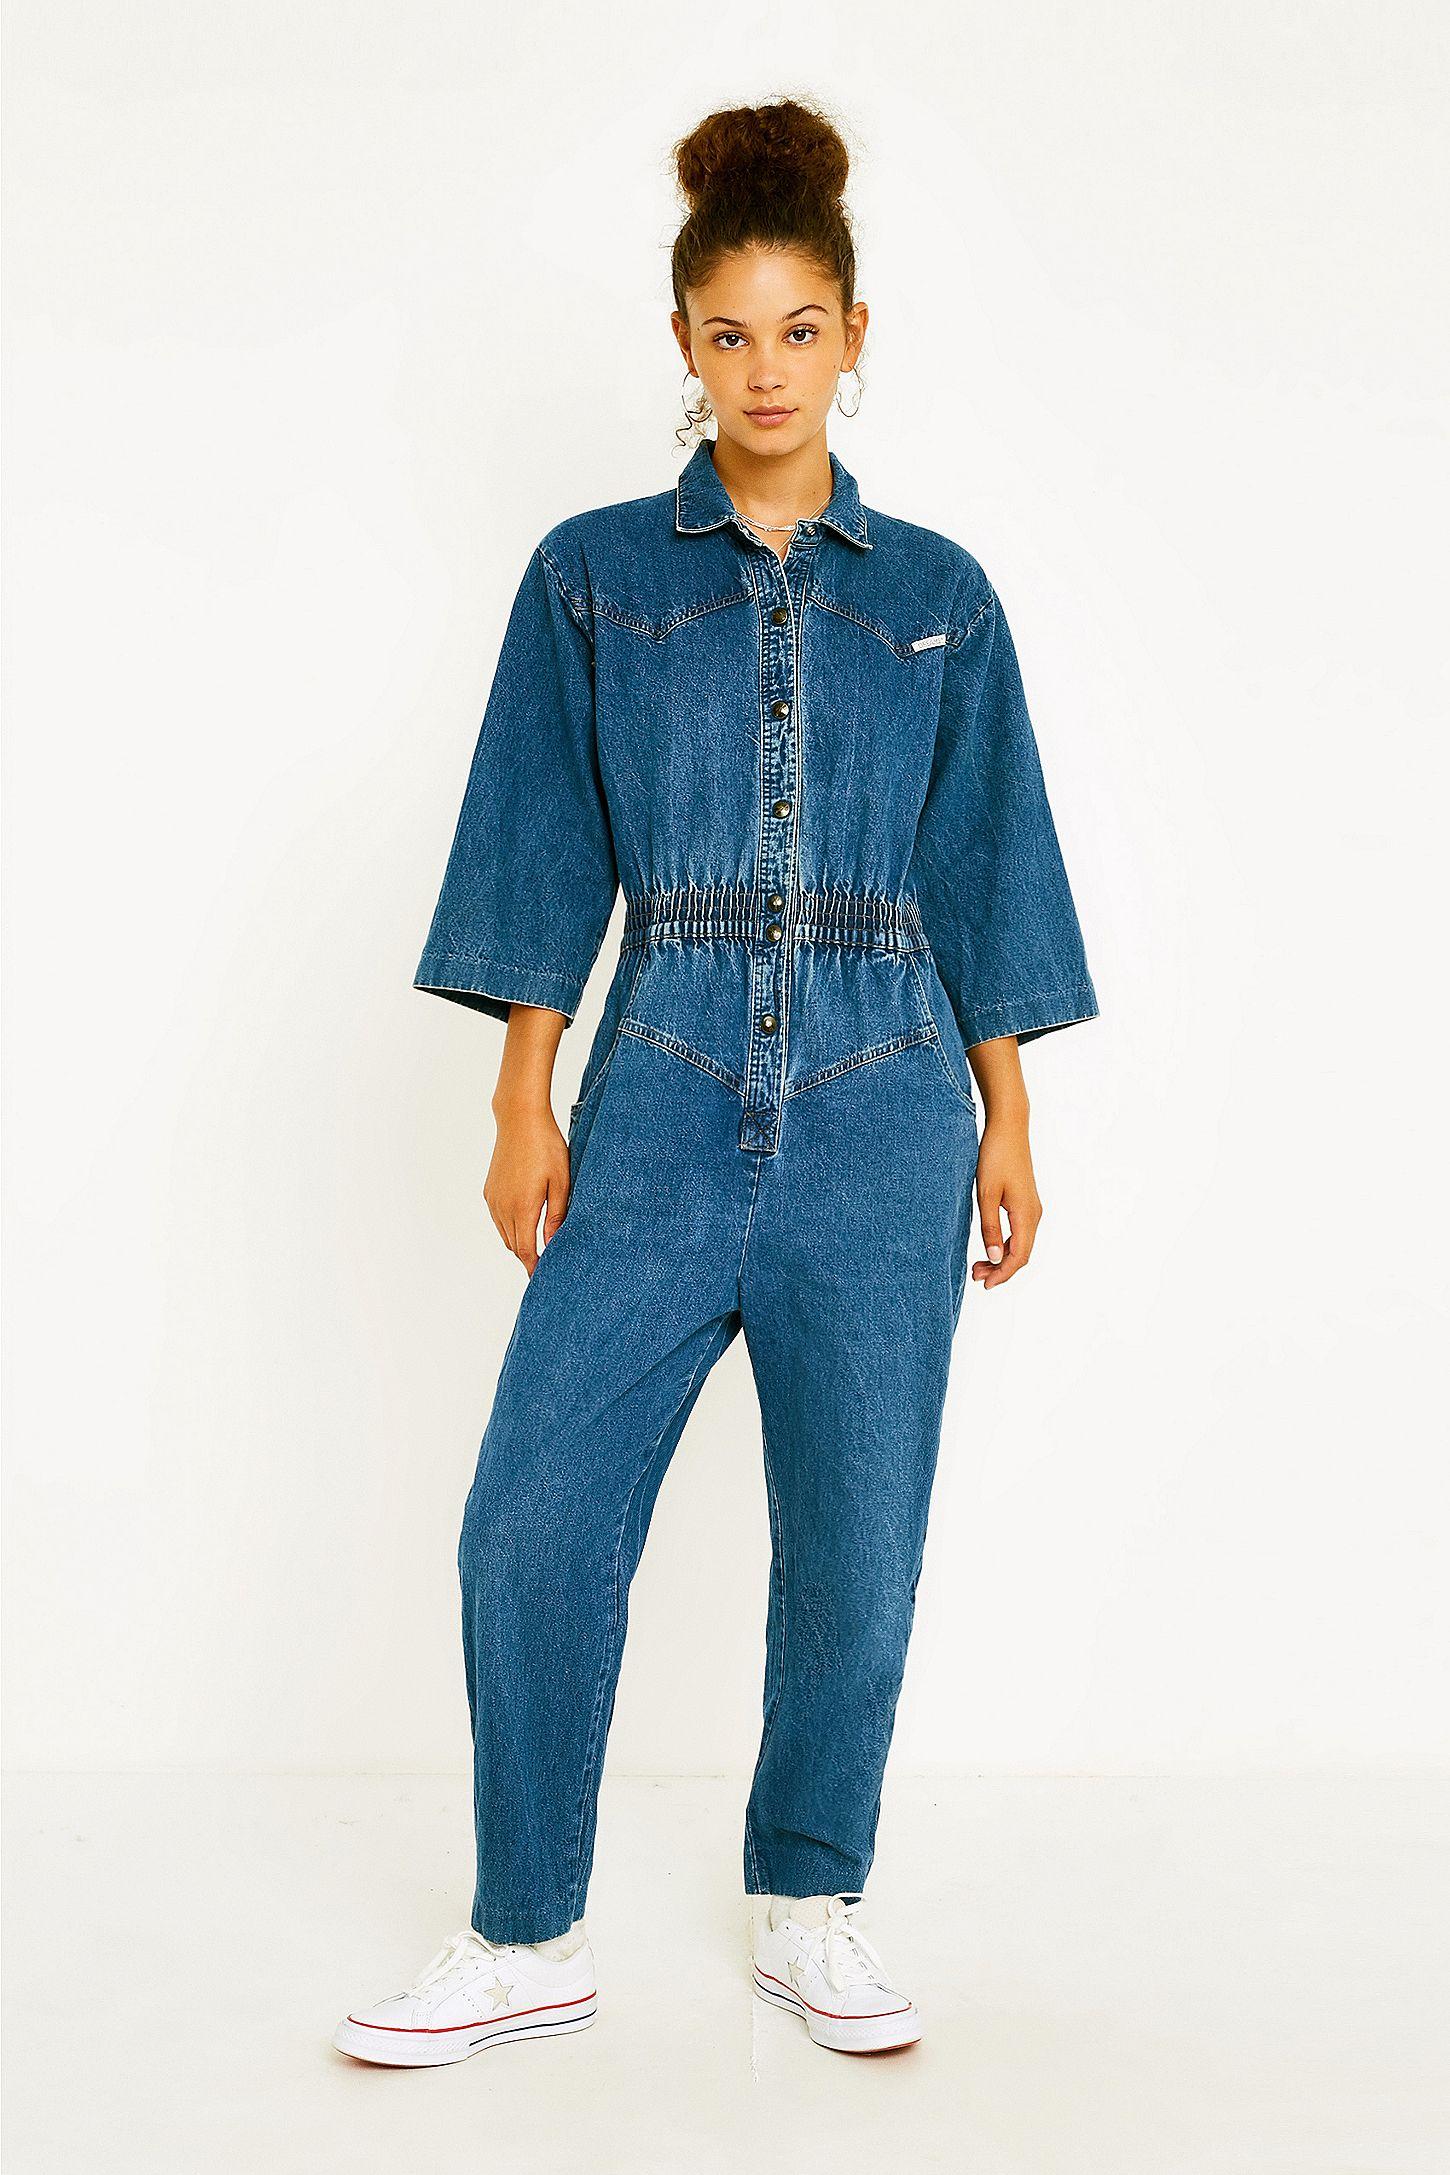 ca970ca3ca7 Urban Renewal Vintage One-of-a-Kind  80s Denim Jumpsuit